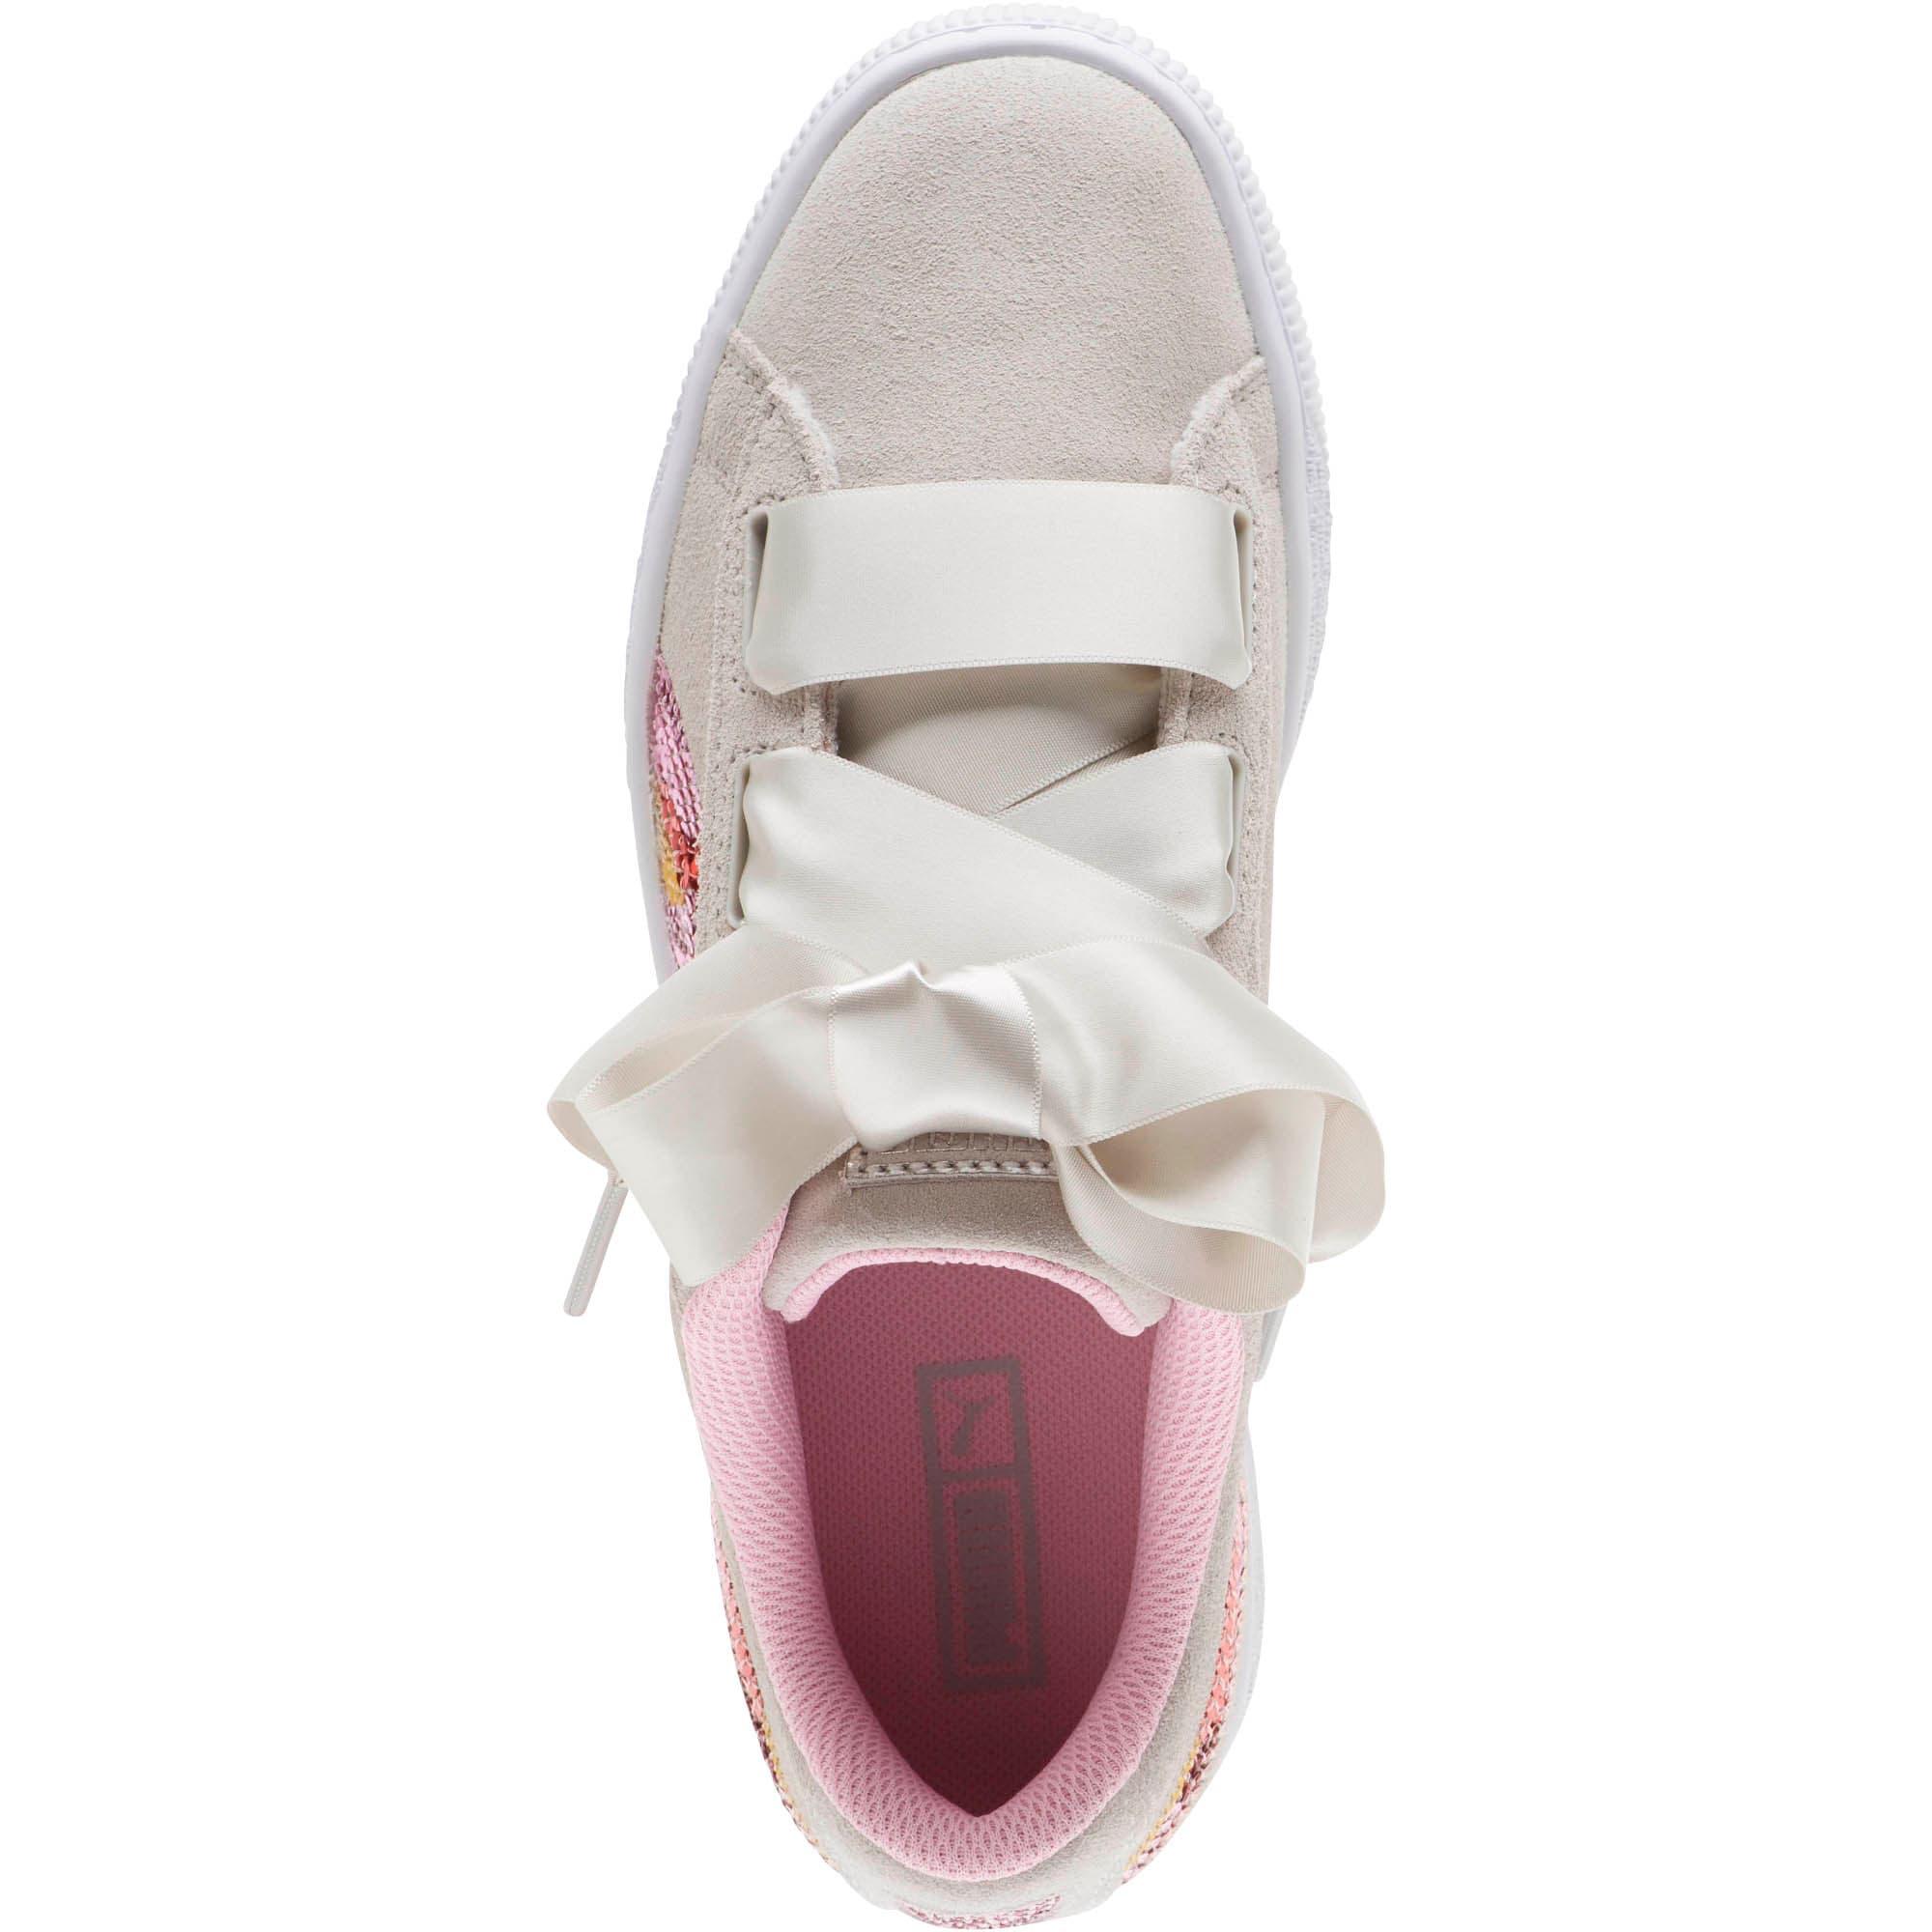 Thumbnail 5 of Suede Heart Trailblazer Sequin Sneakers JR, Gray Violet-Pale Pink, medium